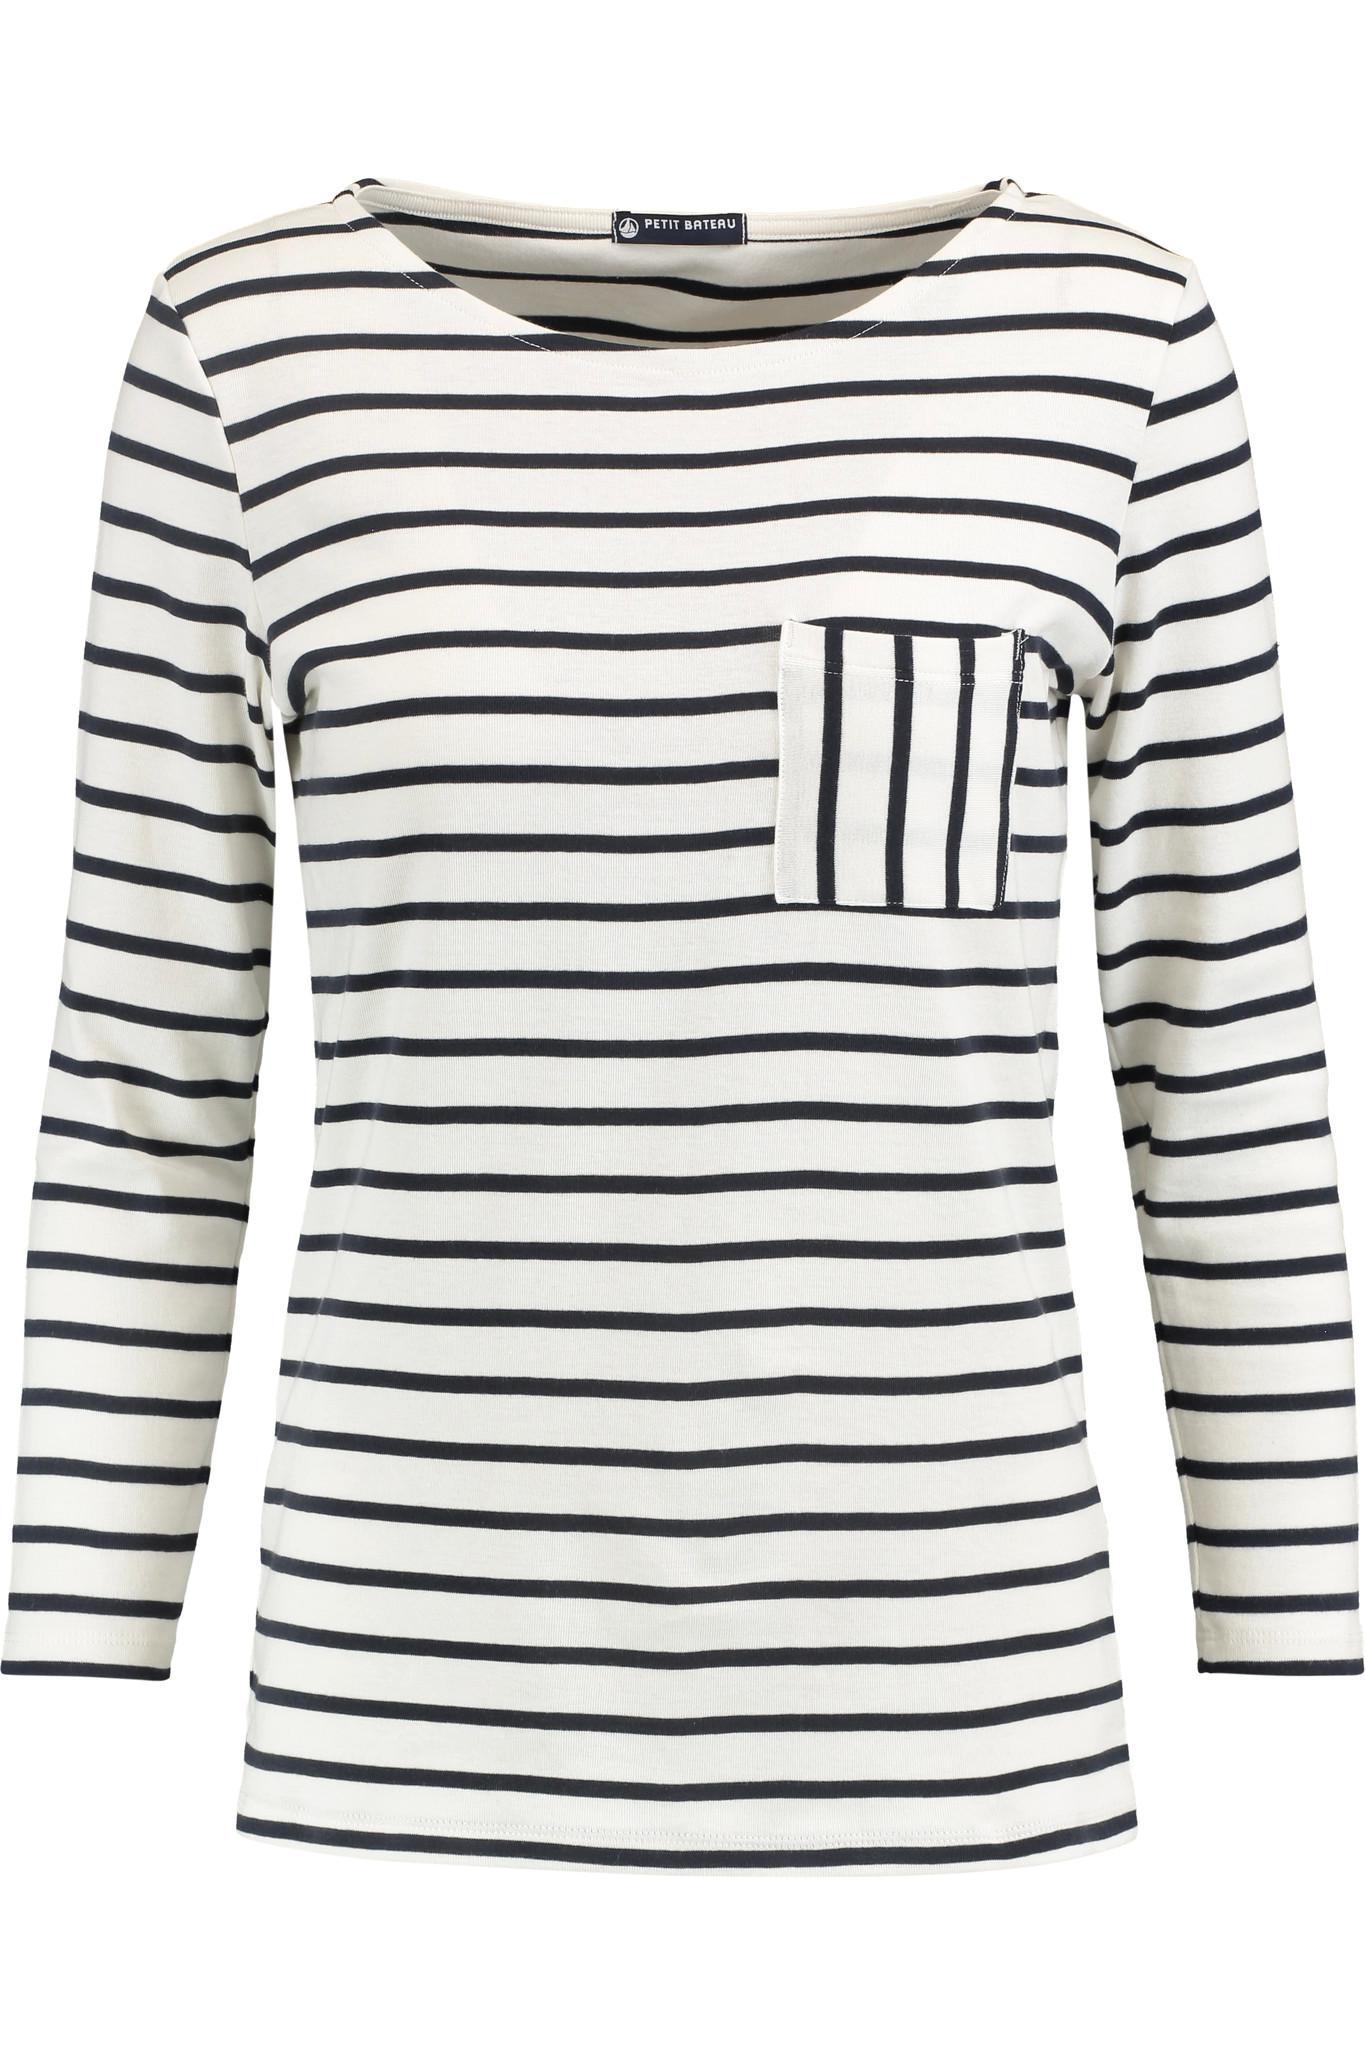 Lyst petit bateau striped cotton jersey top in white for Petit bateau striped shirt